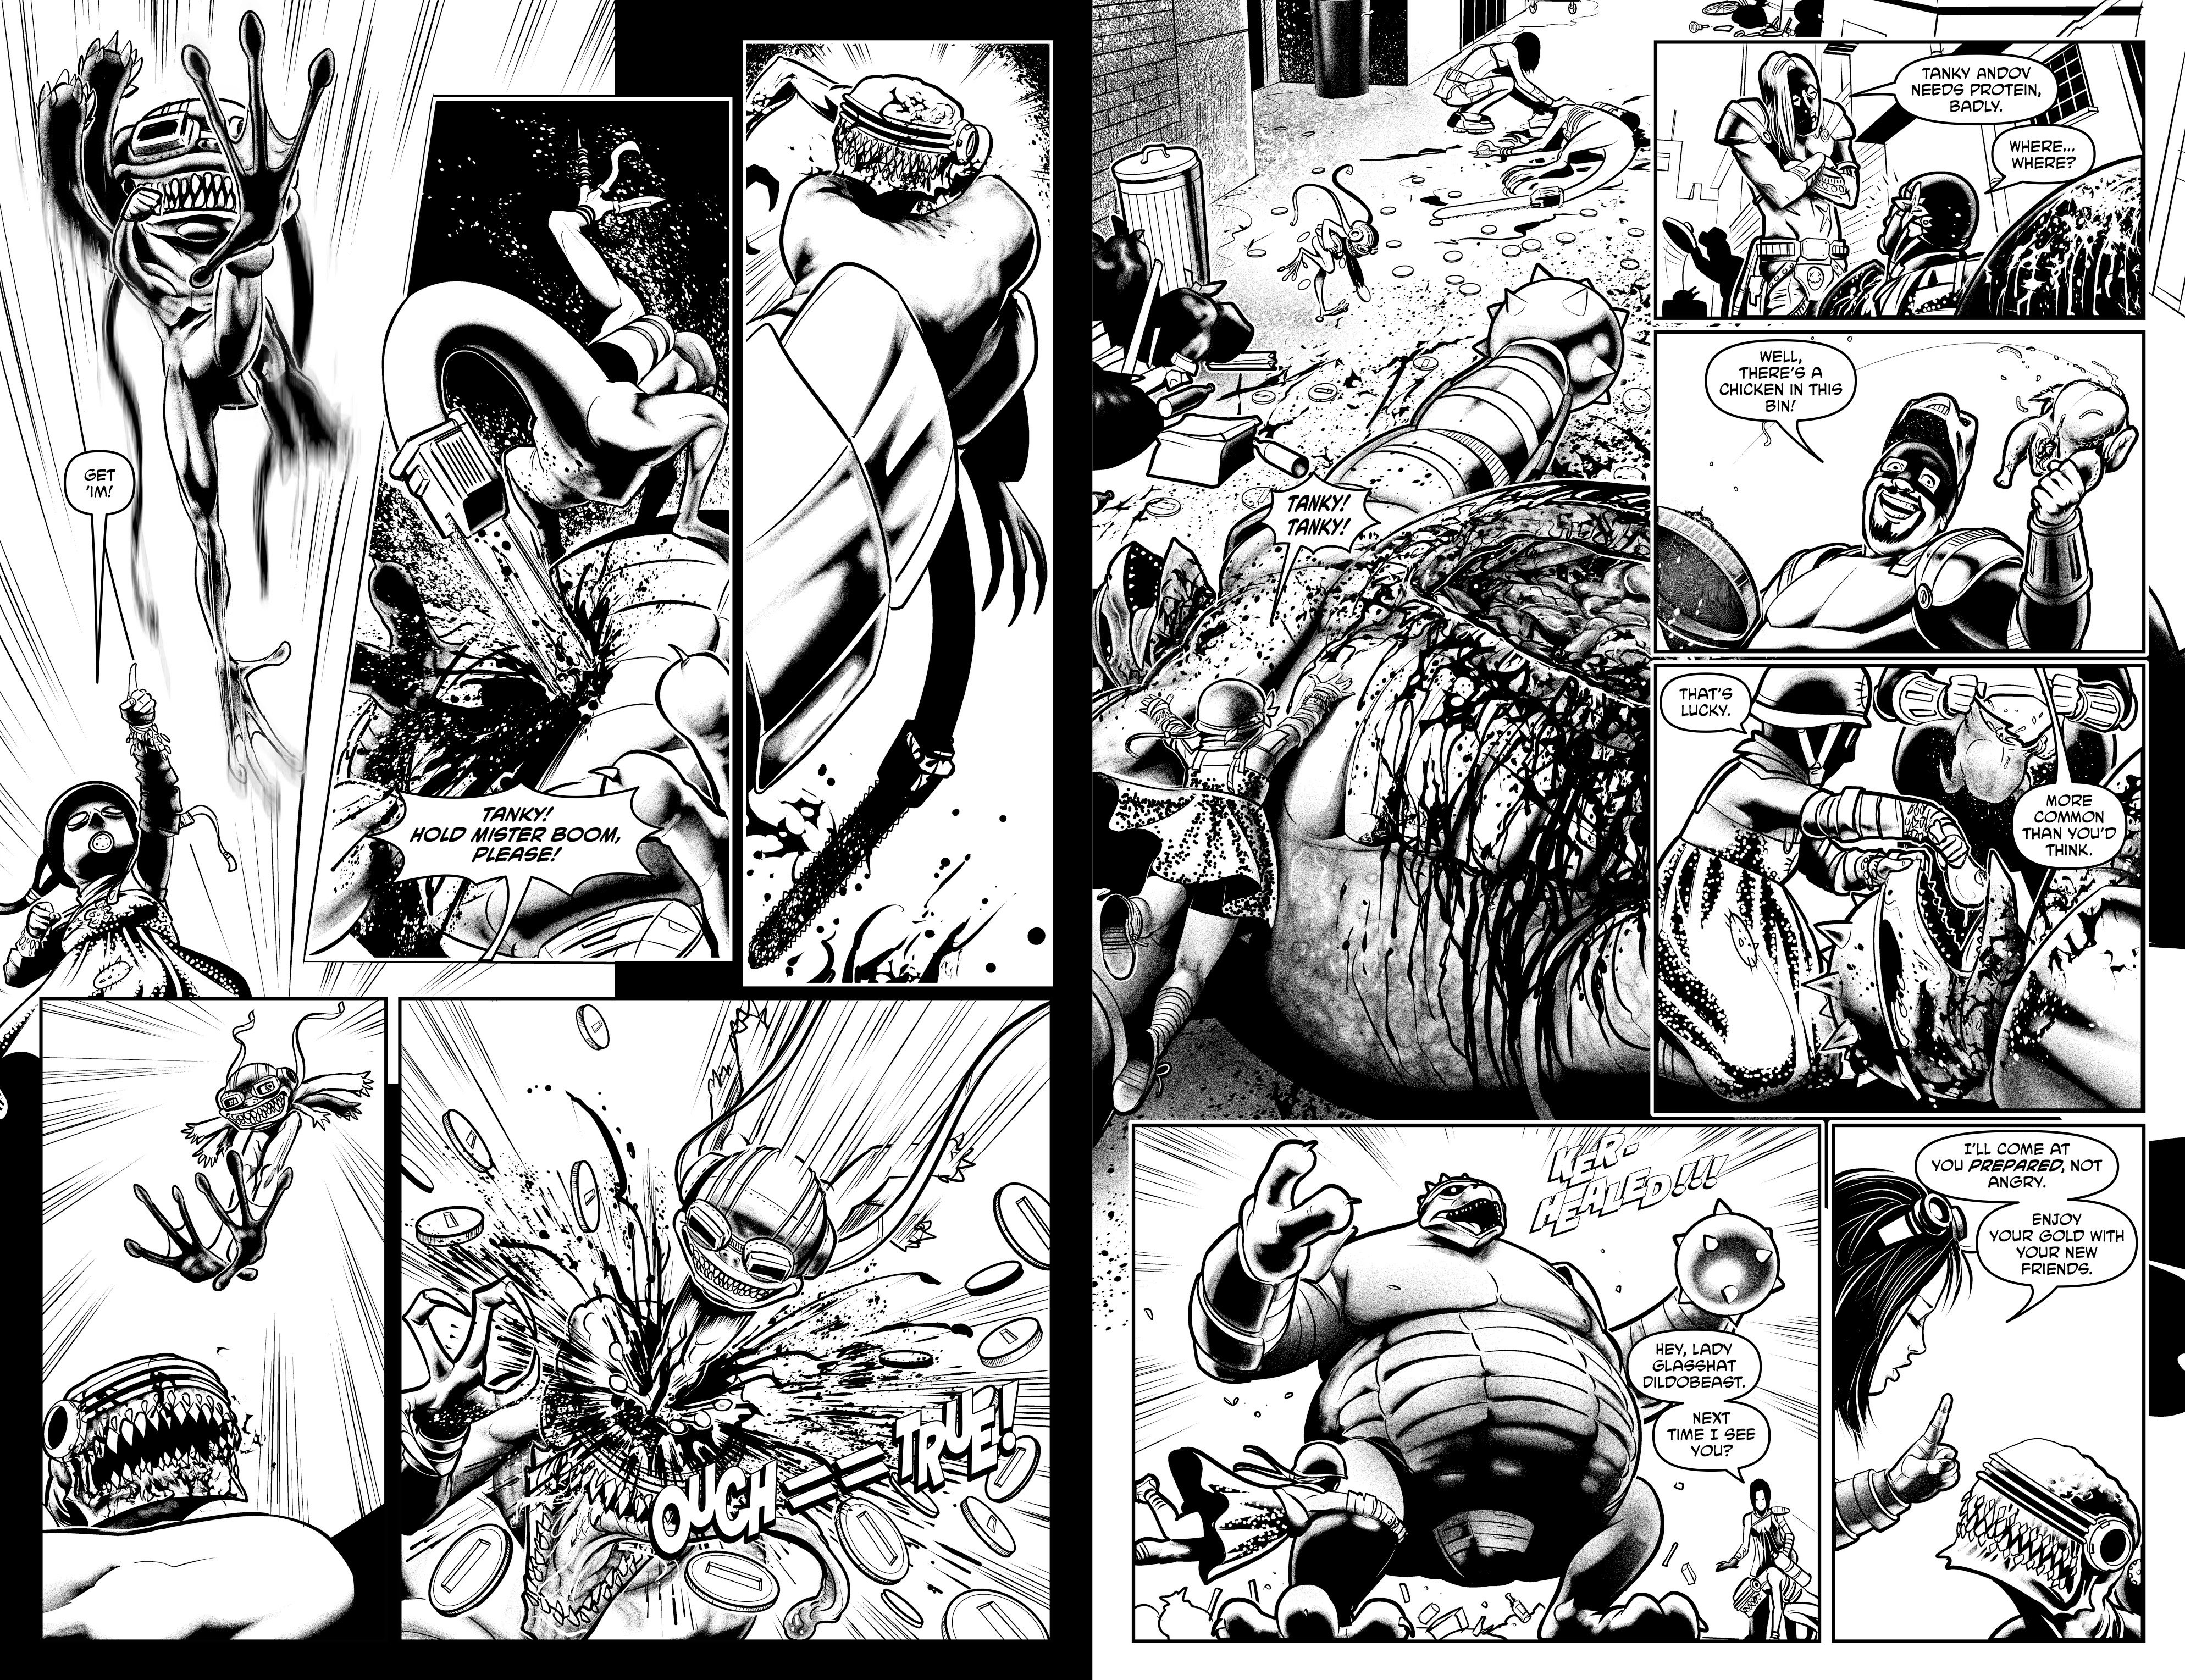 Read online Alan Moore's Cinema Purgatorio comic -  Issue #10 - 25